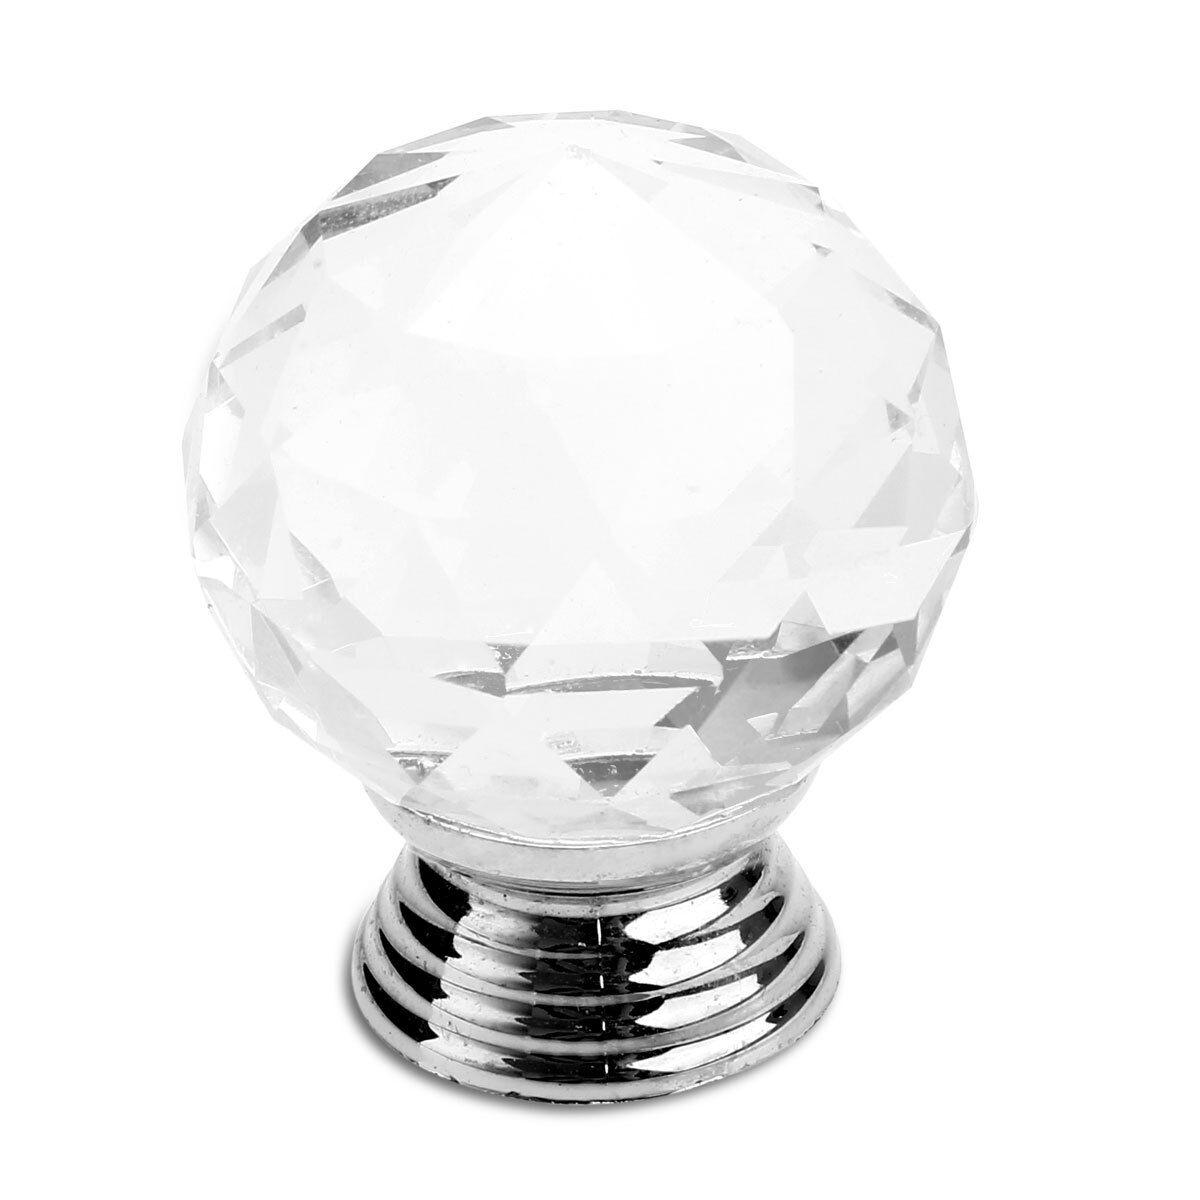 1-32 Stück Glas Kristall Türknöpfe Möbelknöpfe Türgriff Schrank Knopf  Möbelgrif